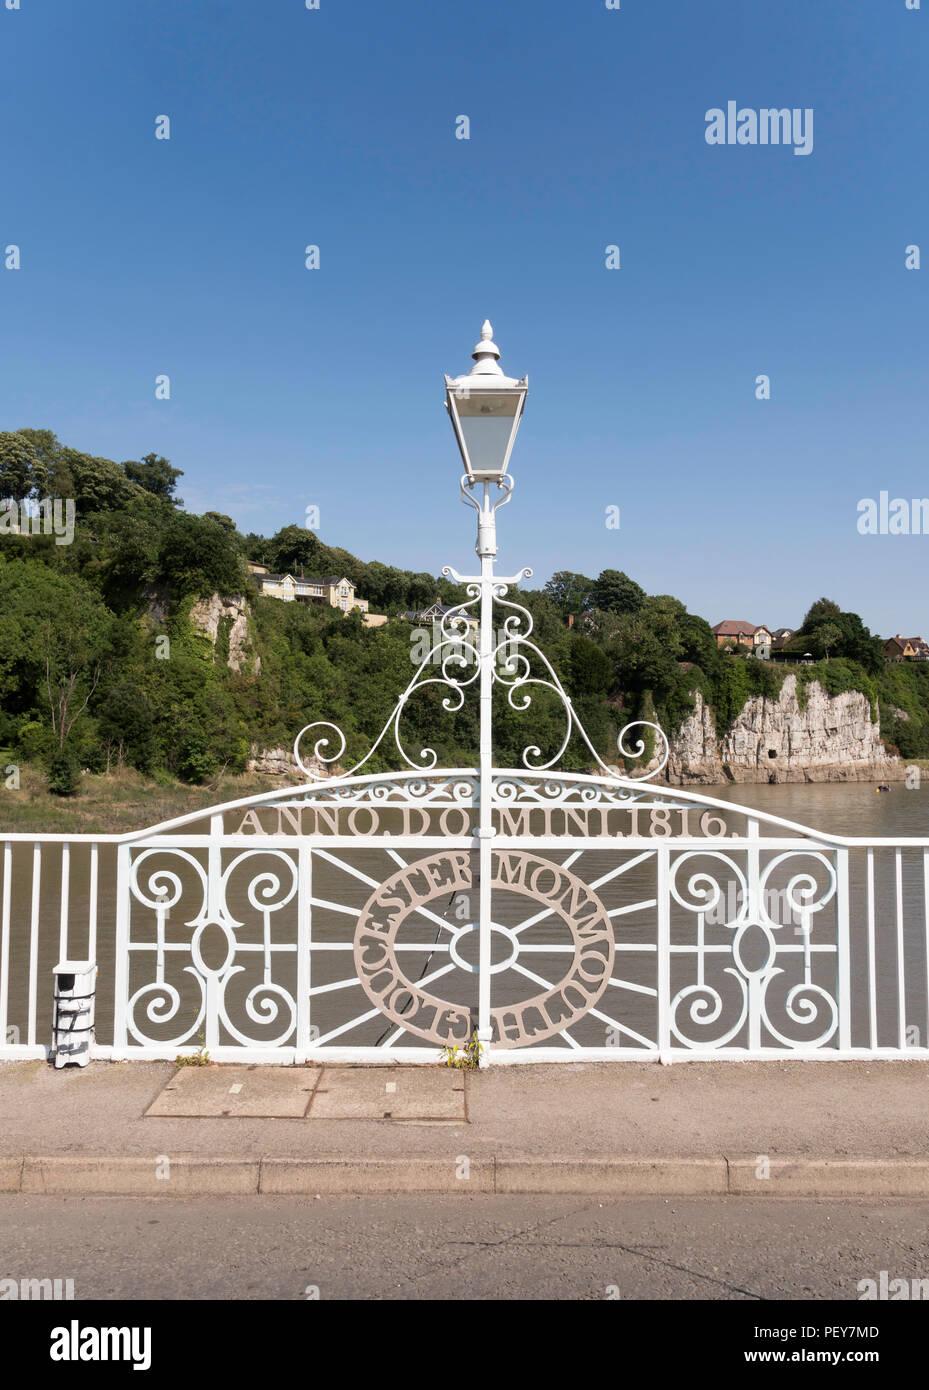 Lamp post on the old Wye Bridge marking English Welsh border, Chepstow, Monmouthshire, Wales, UK Stock Photo